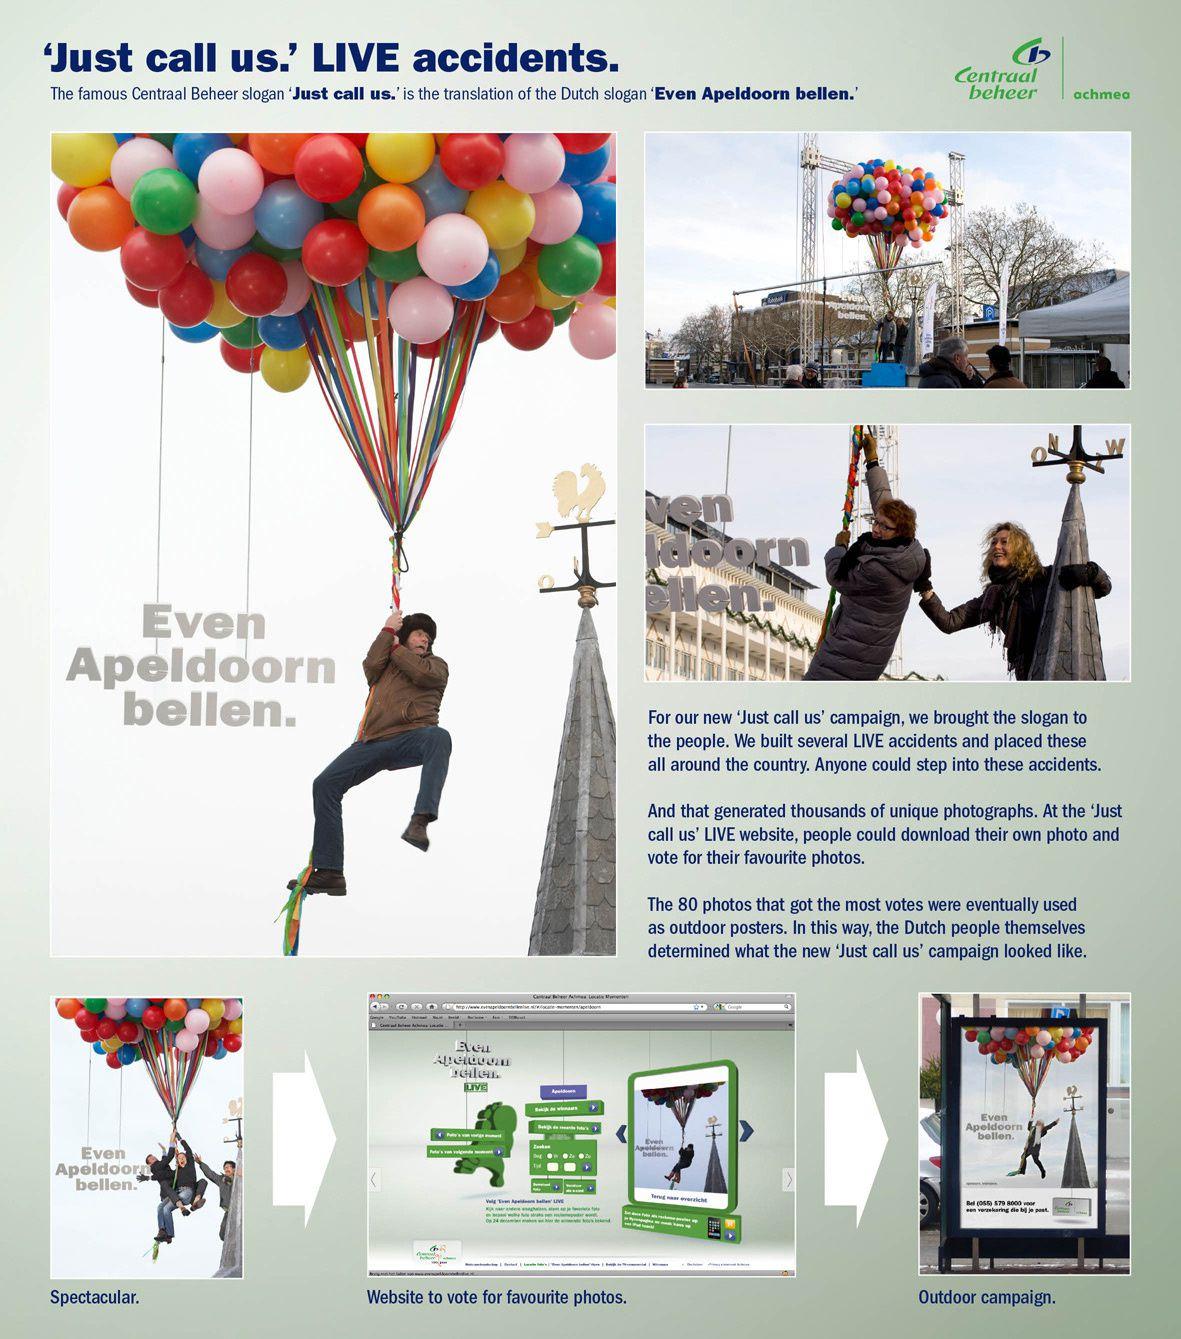 coupsdepub_CBA-Live-Accidents4_1.jpg